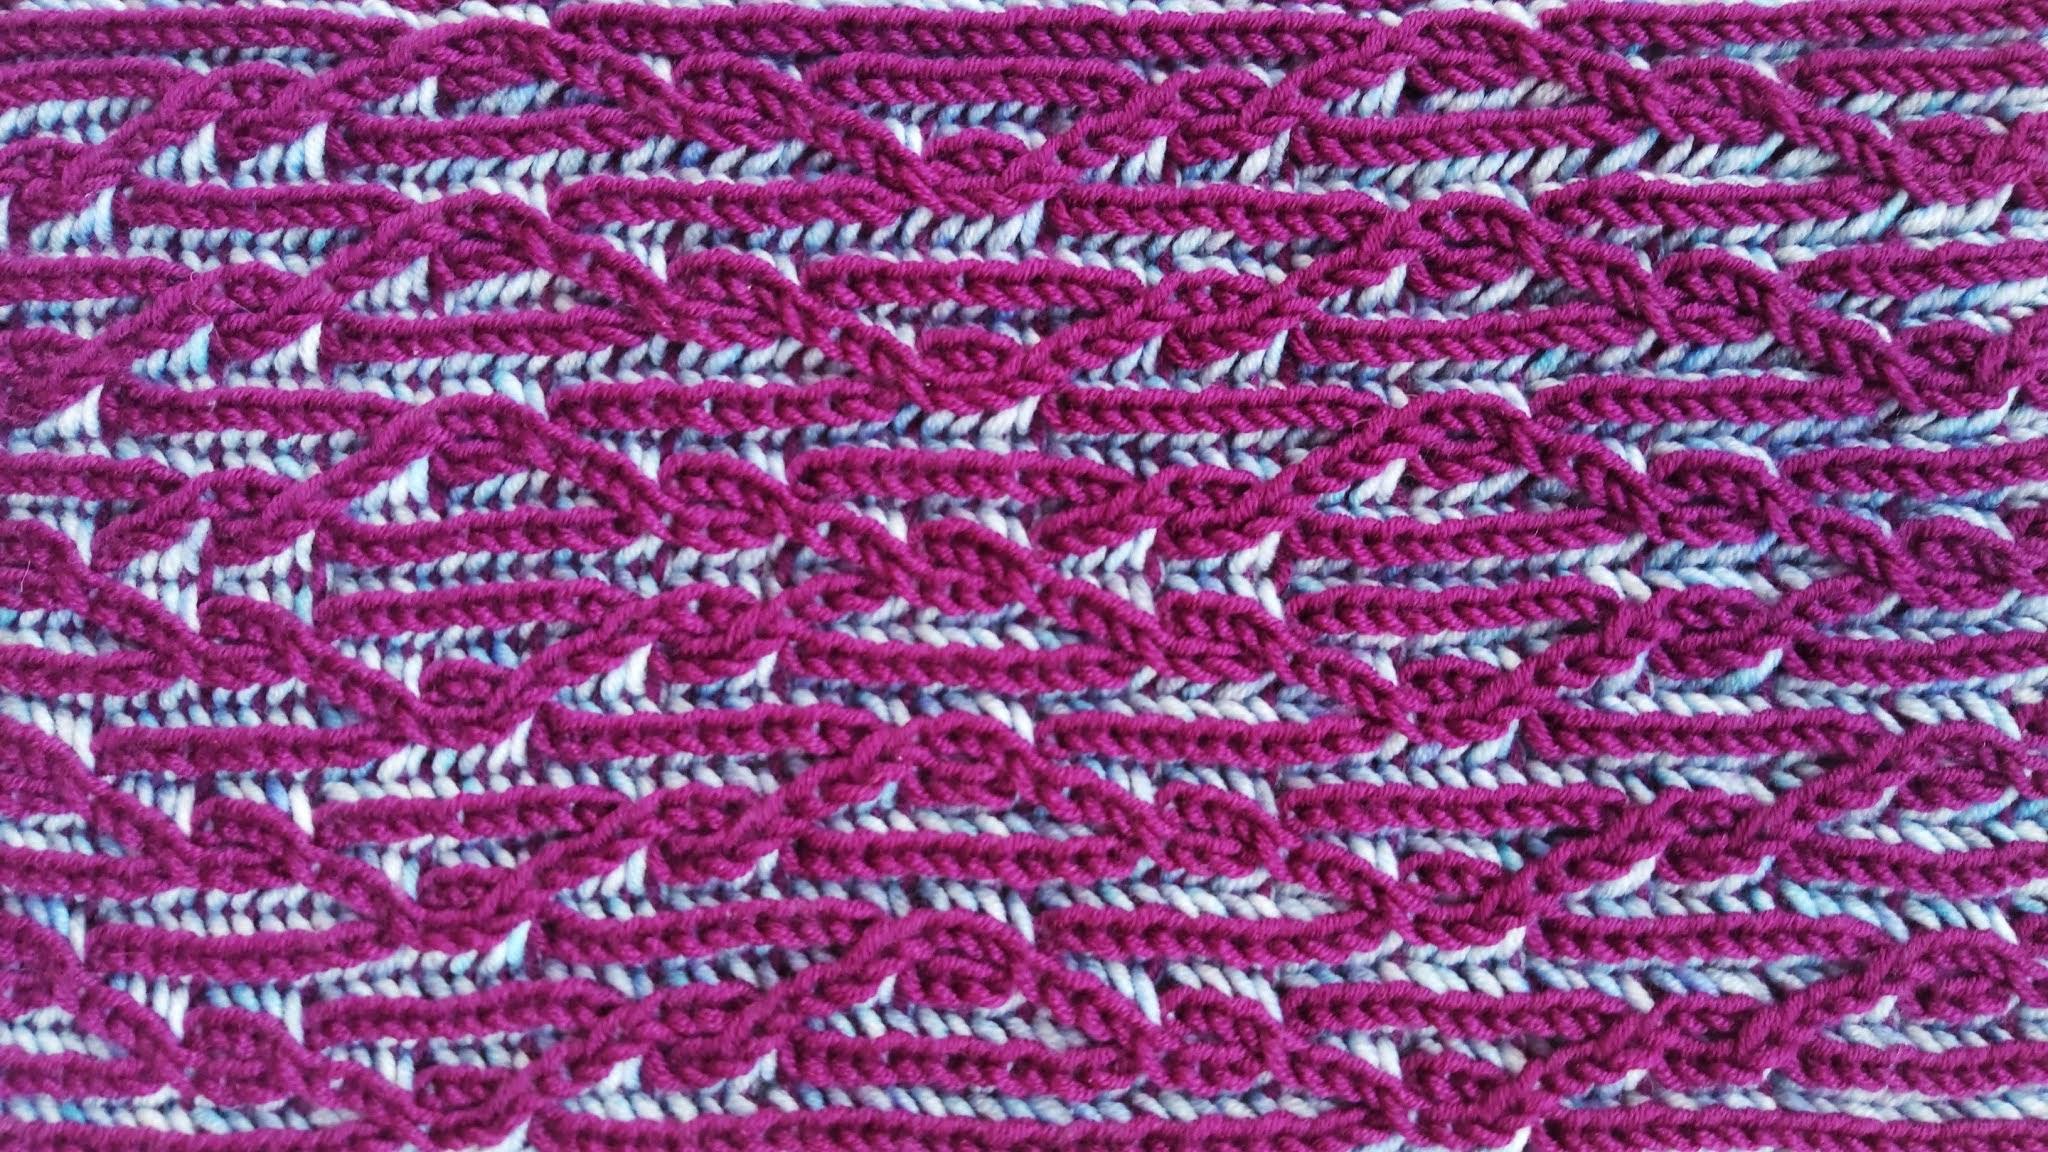 Briaran Scarf - Brioche Knitting